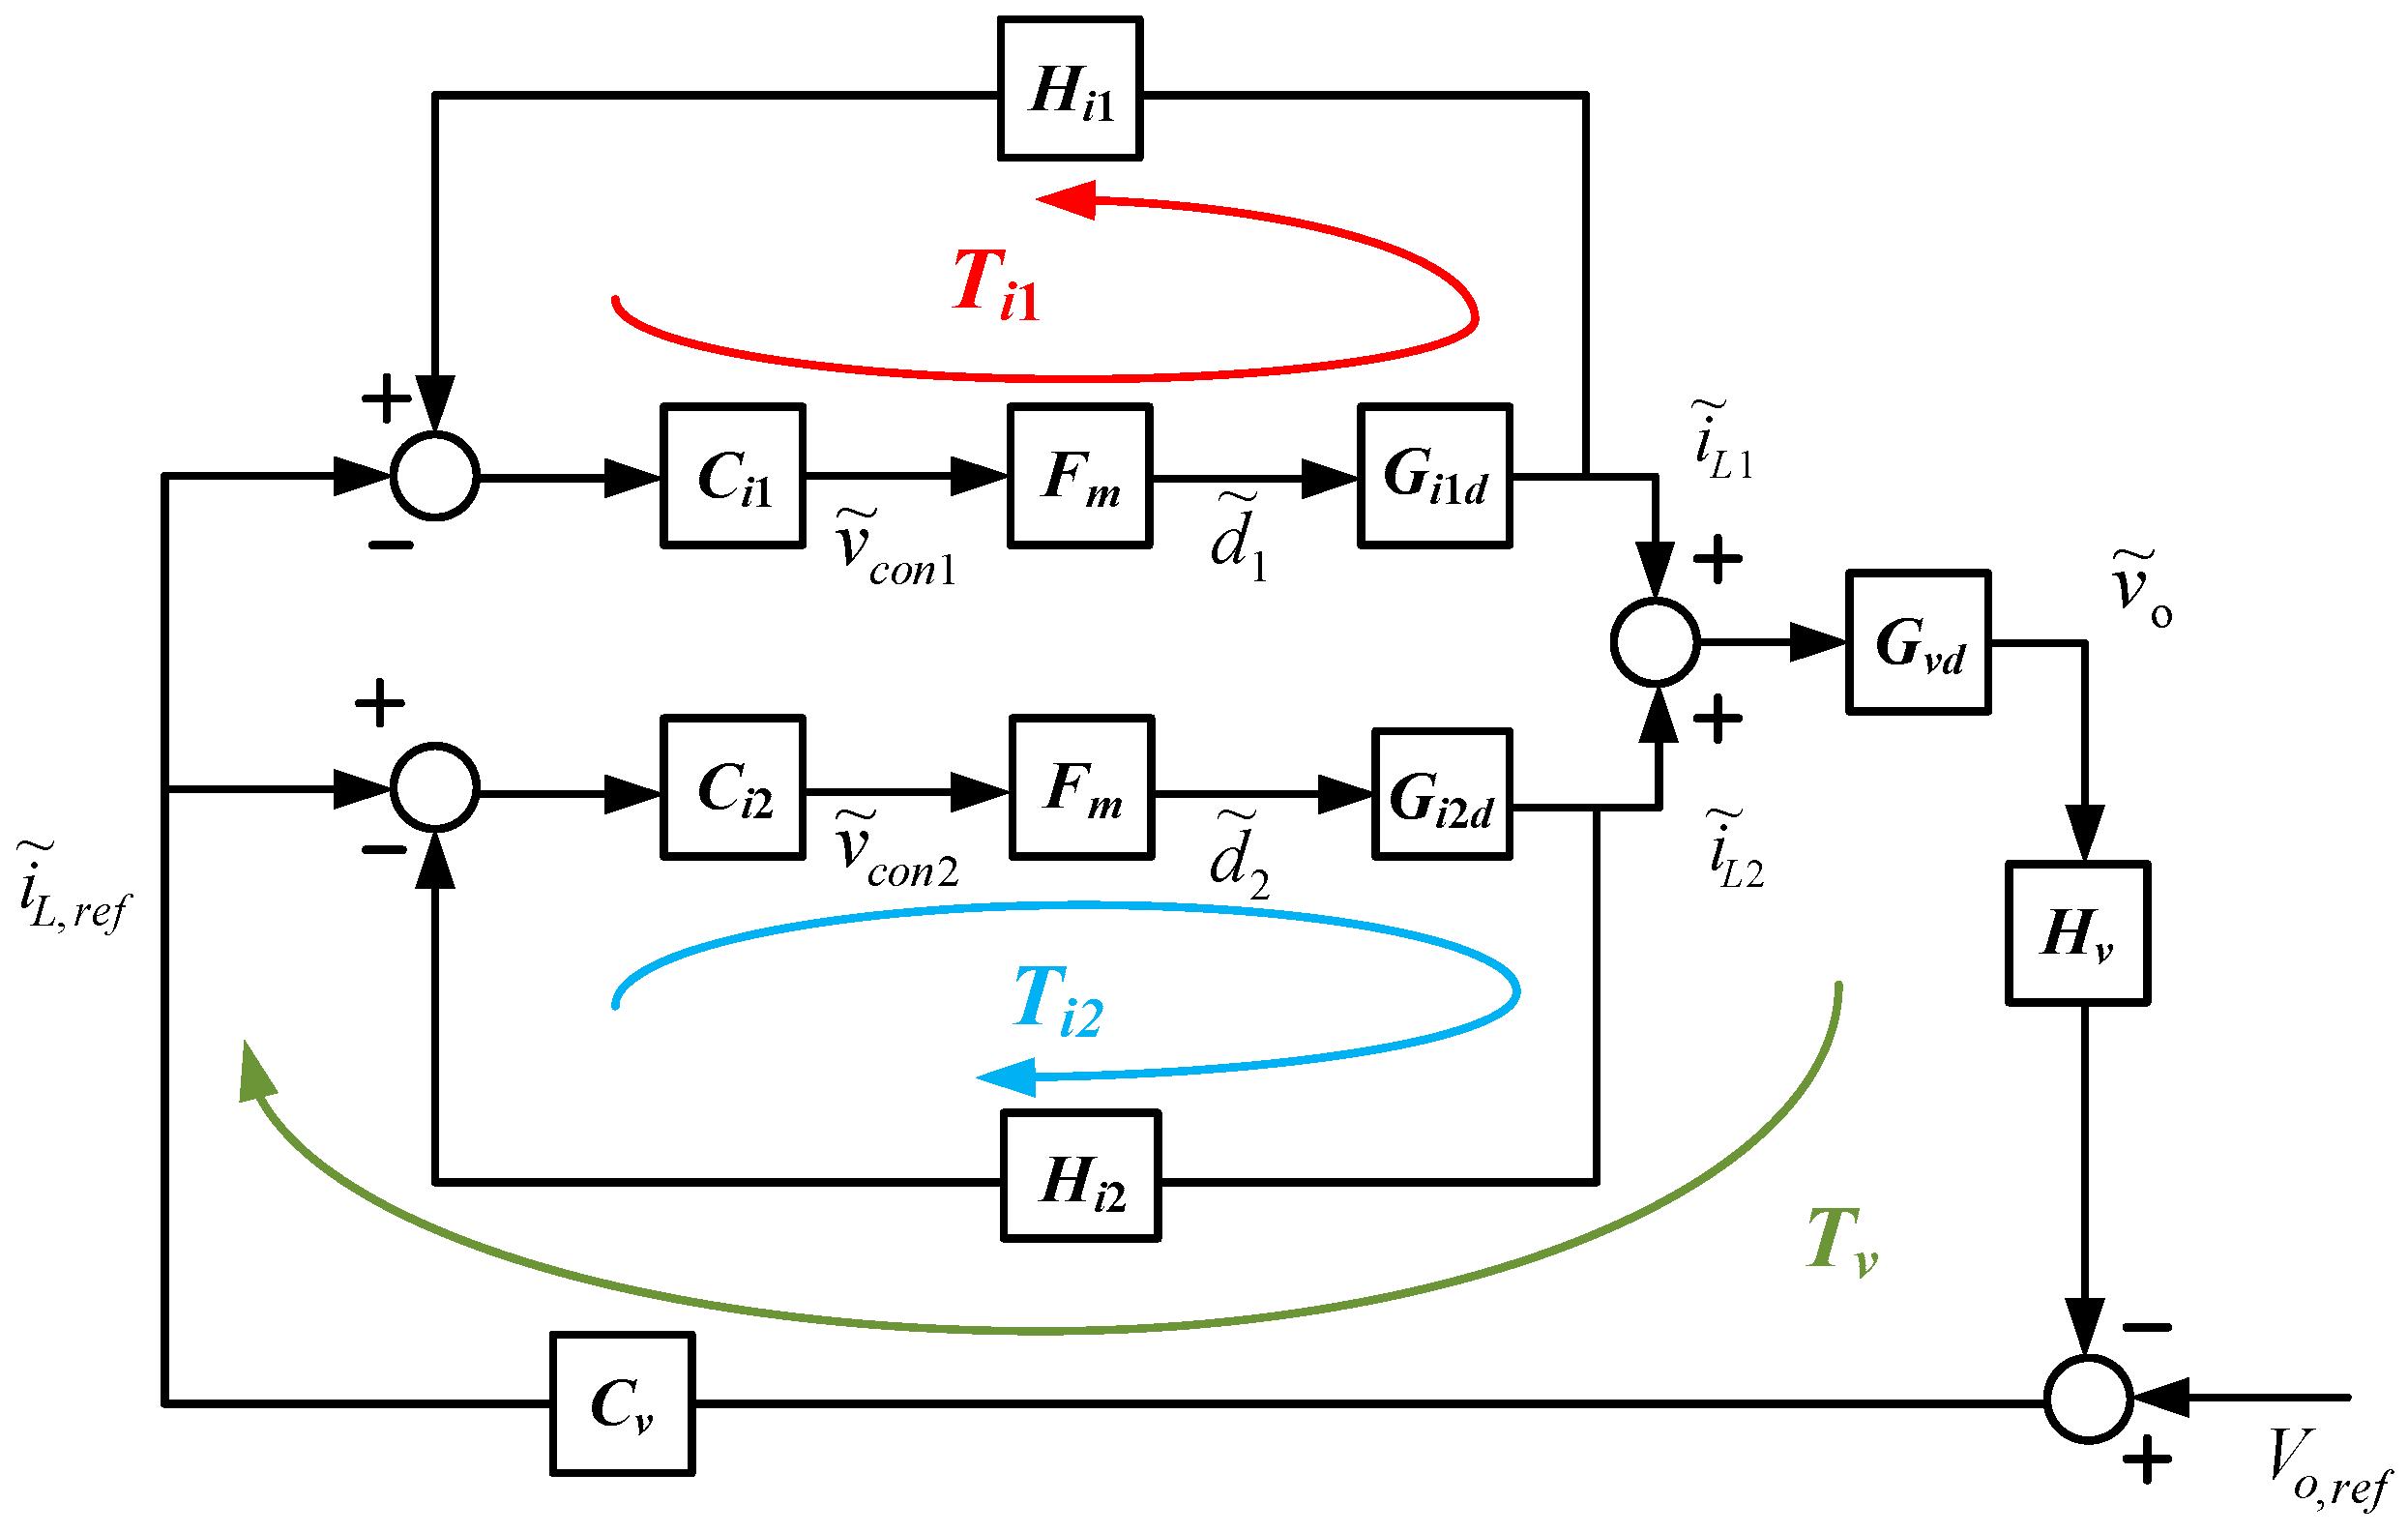 block diagram for closed loop control system